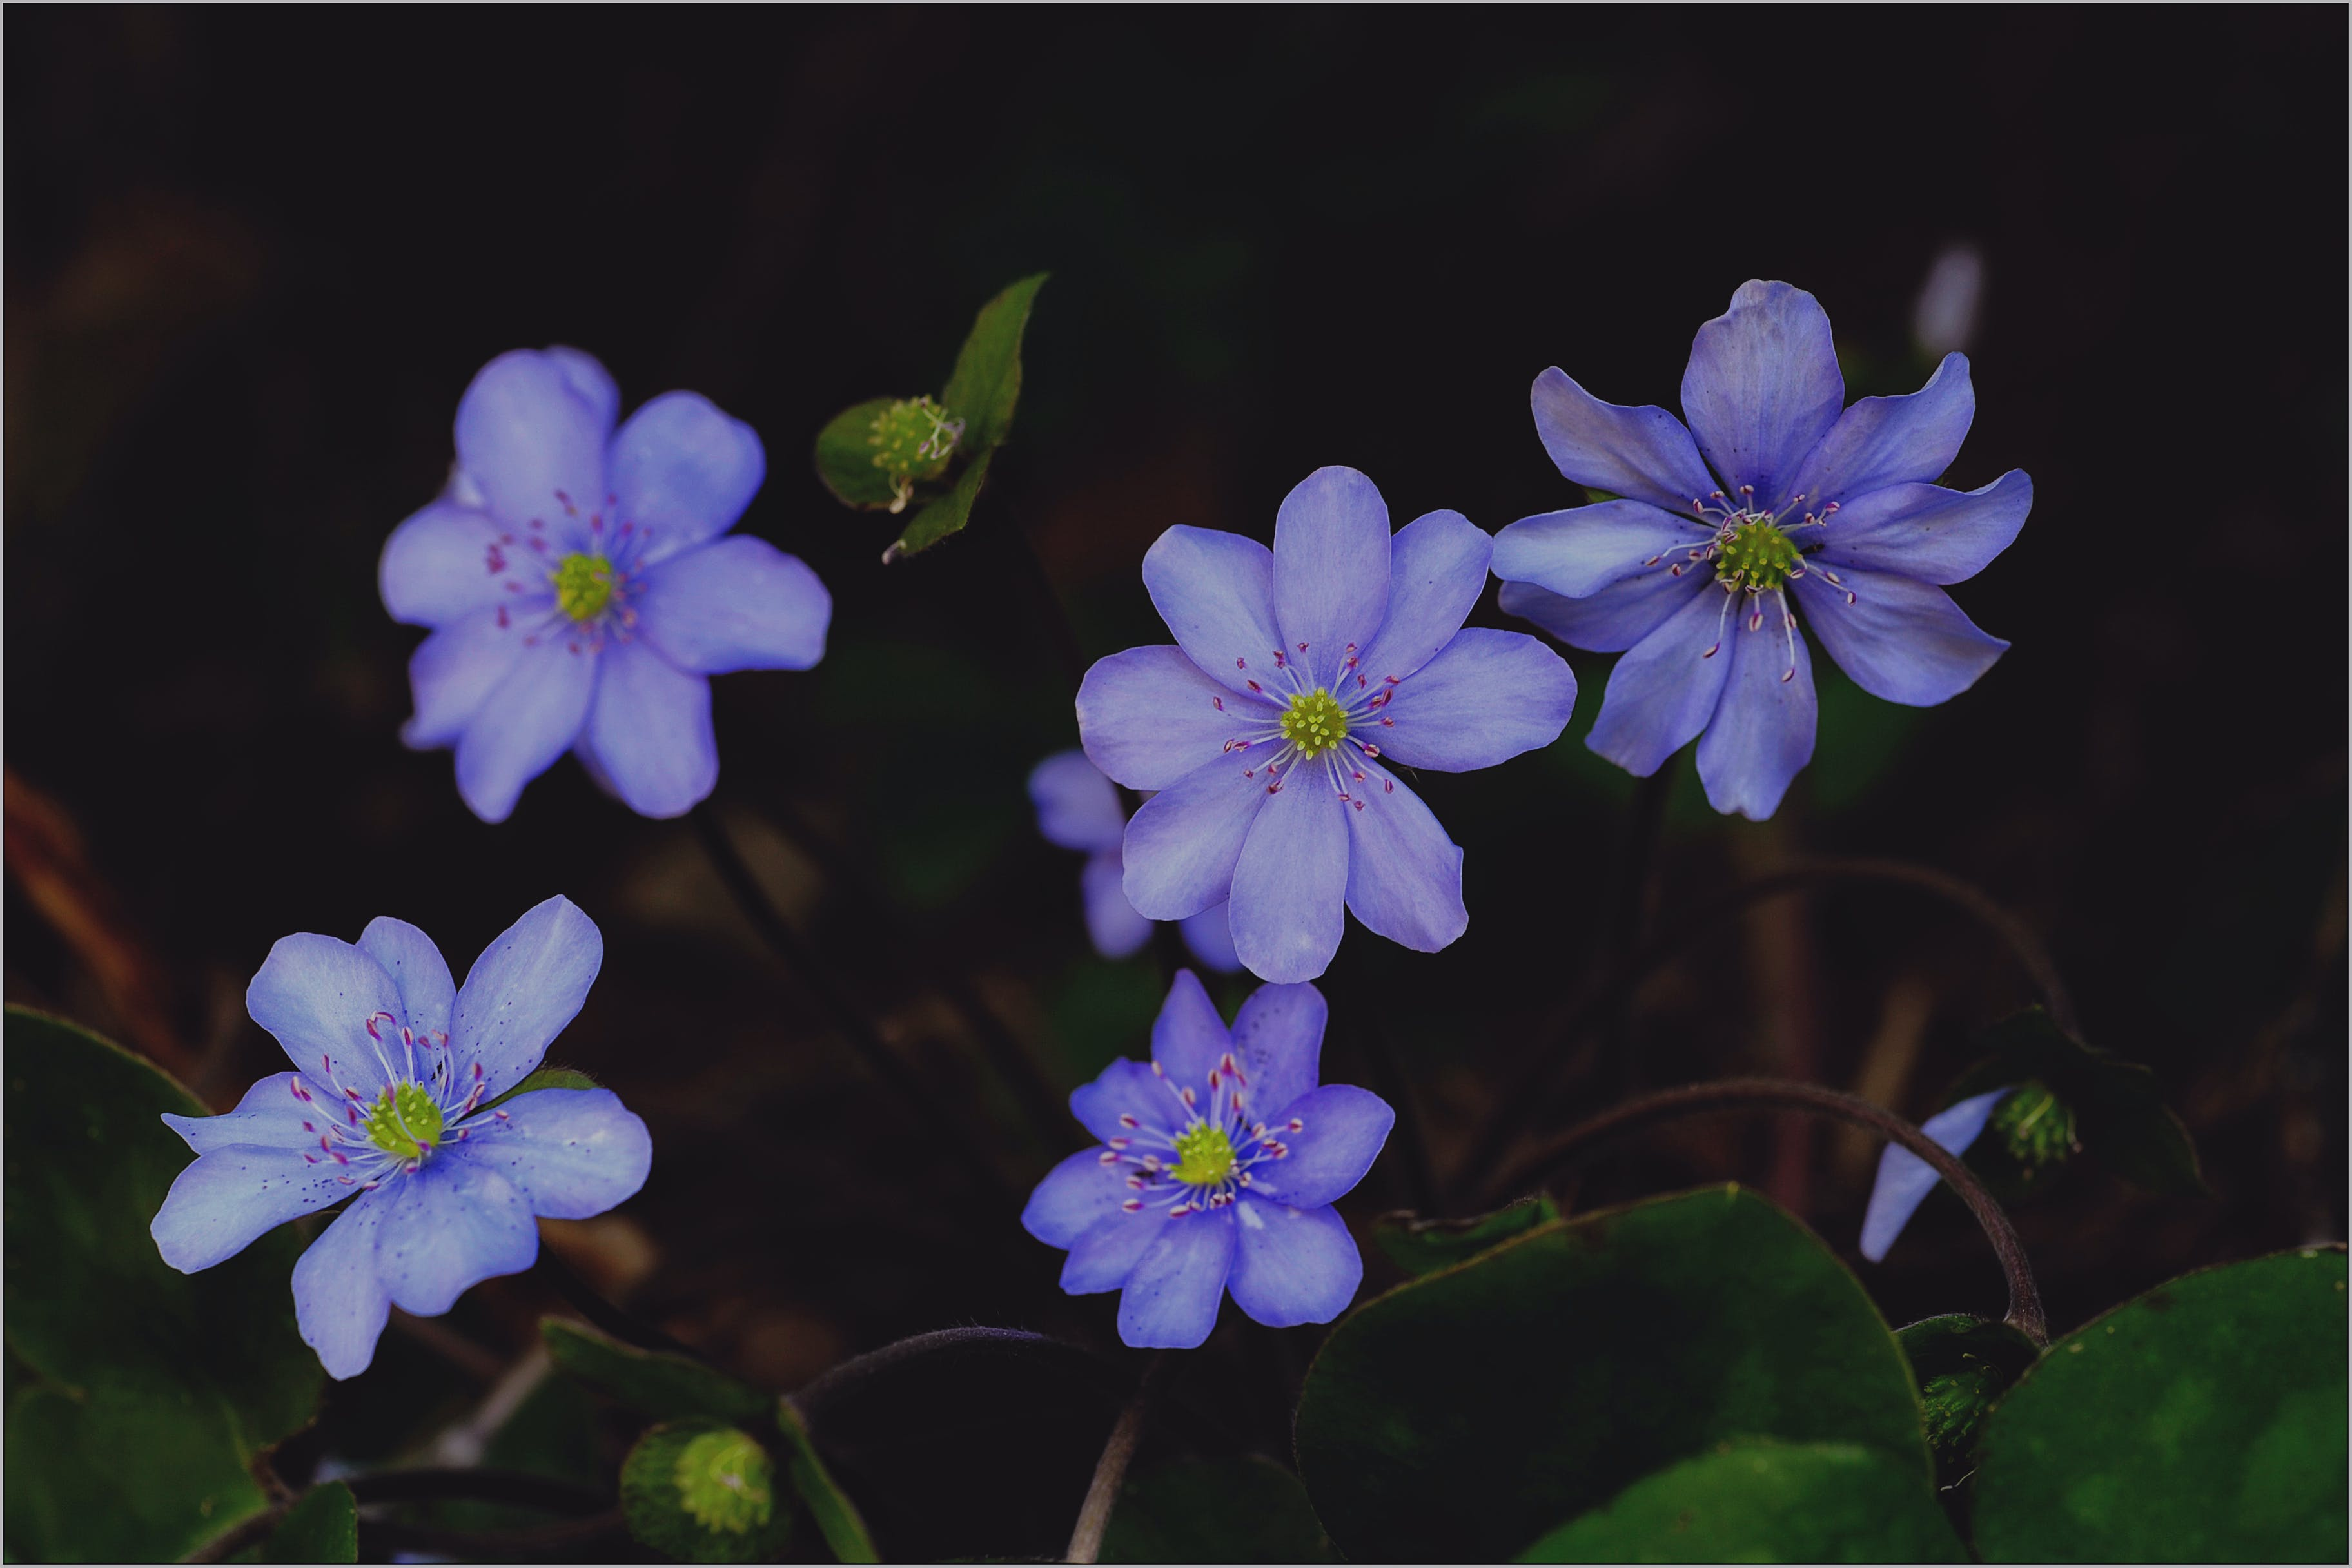 Purple Hepaticas in Bloom Close-up Photo